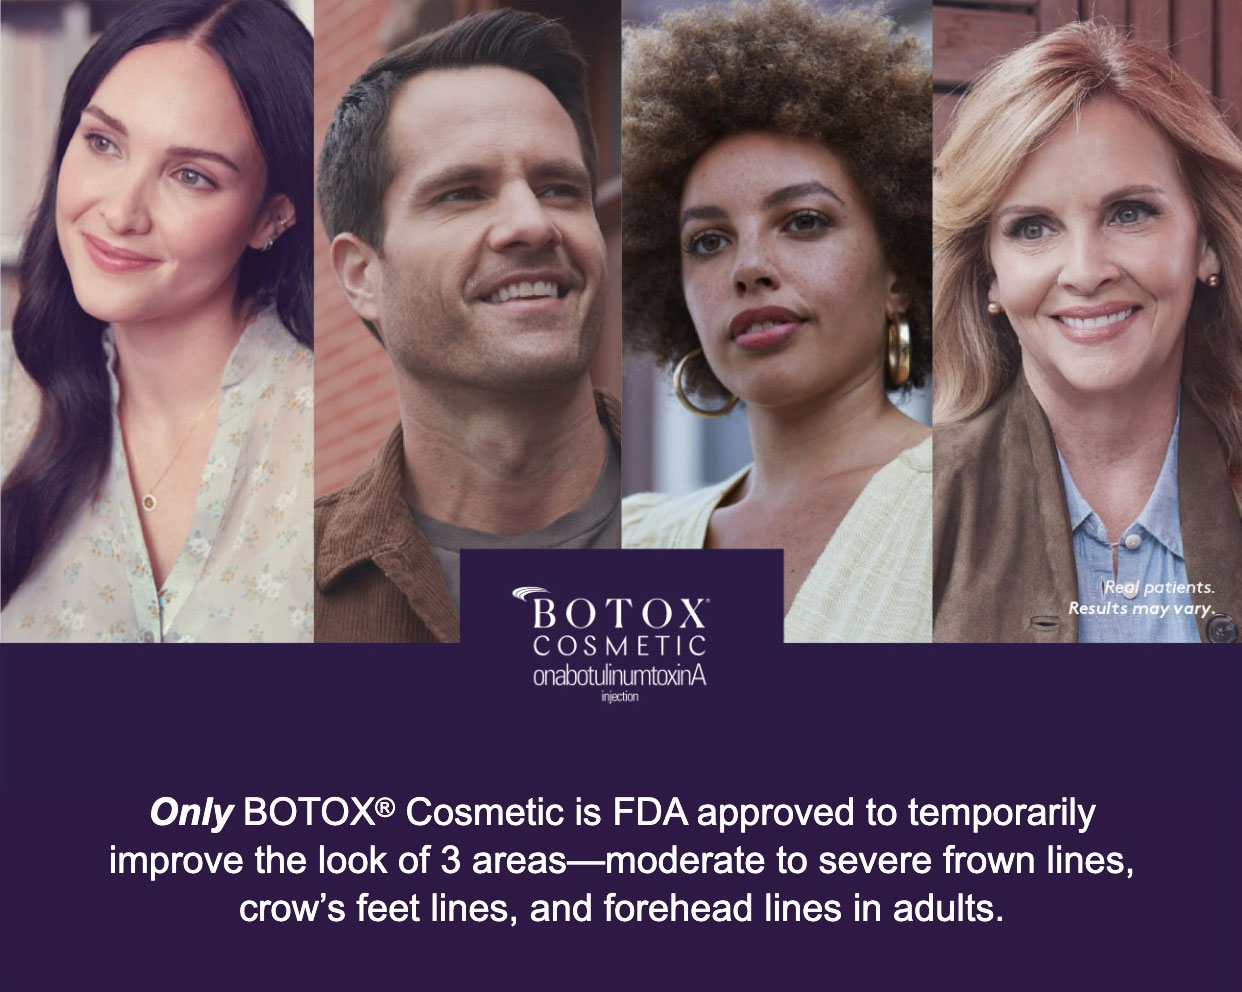 image of botox ad